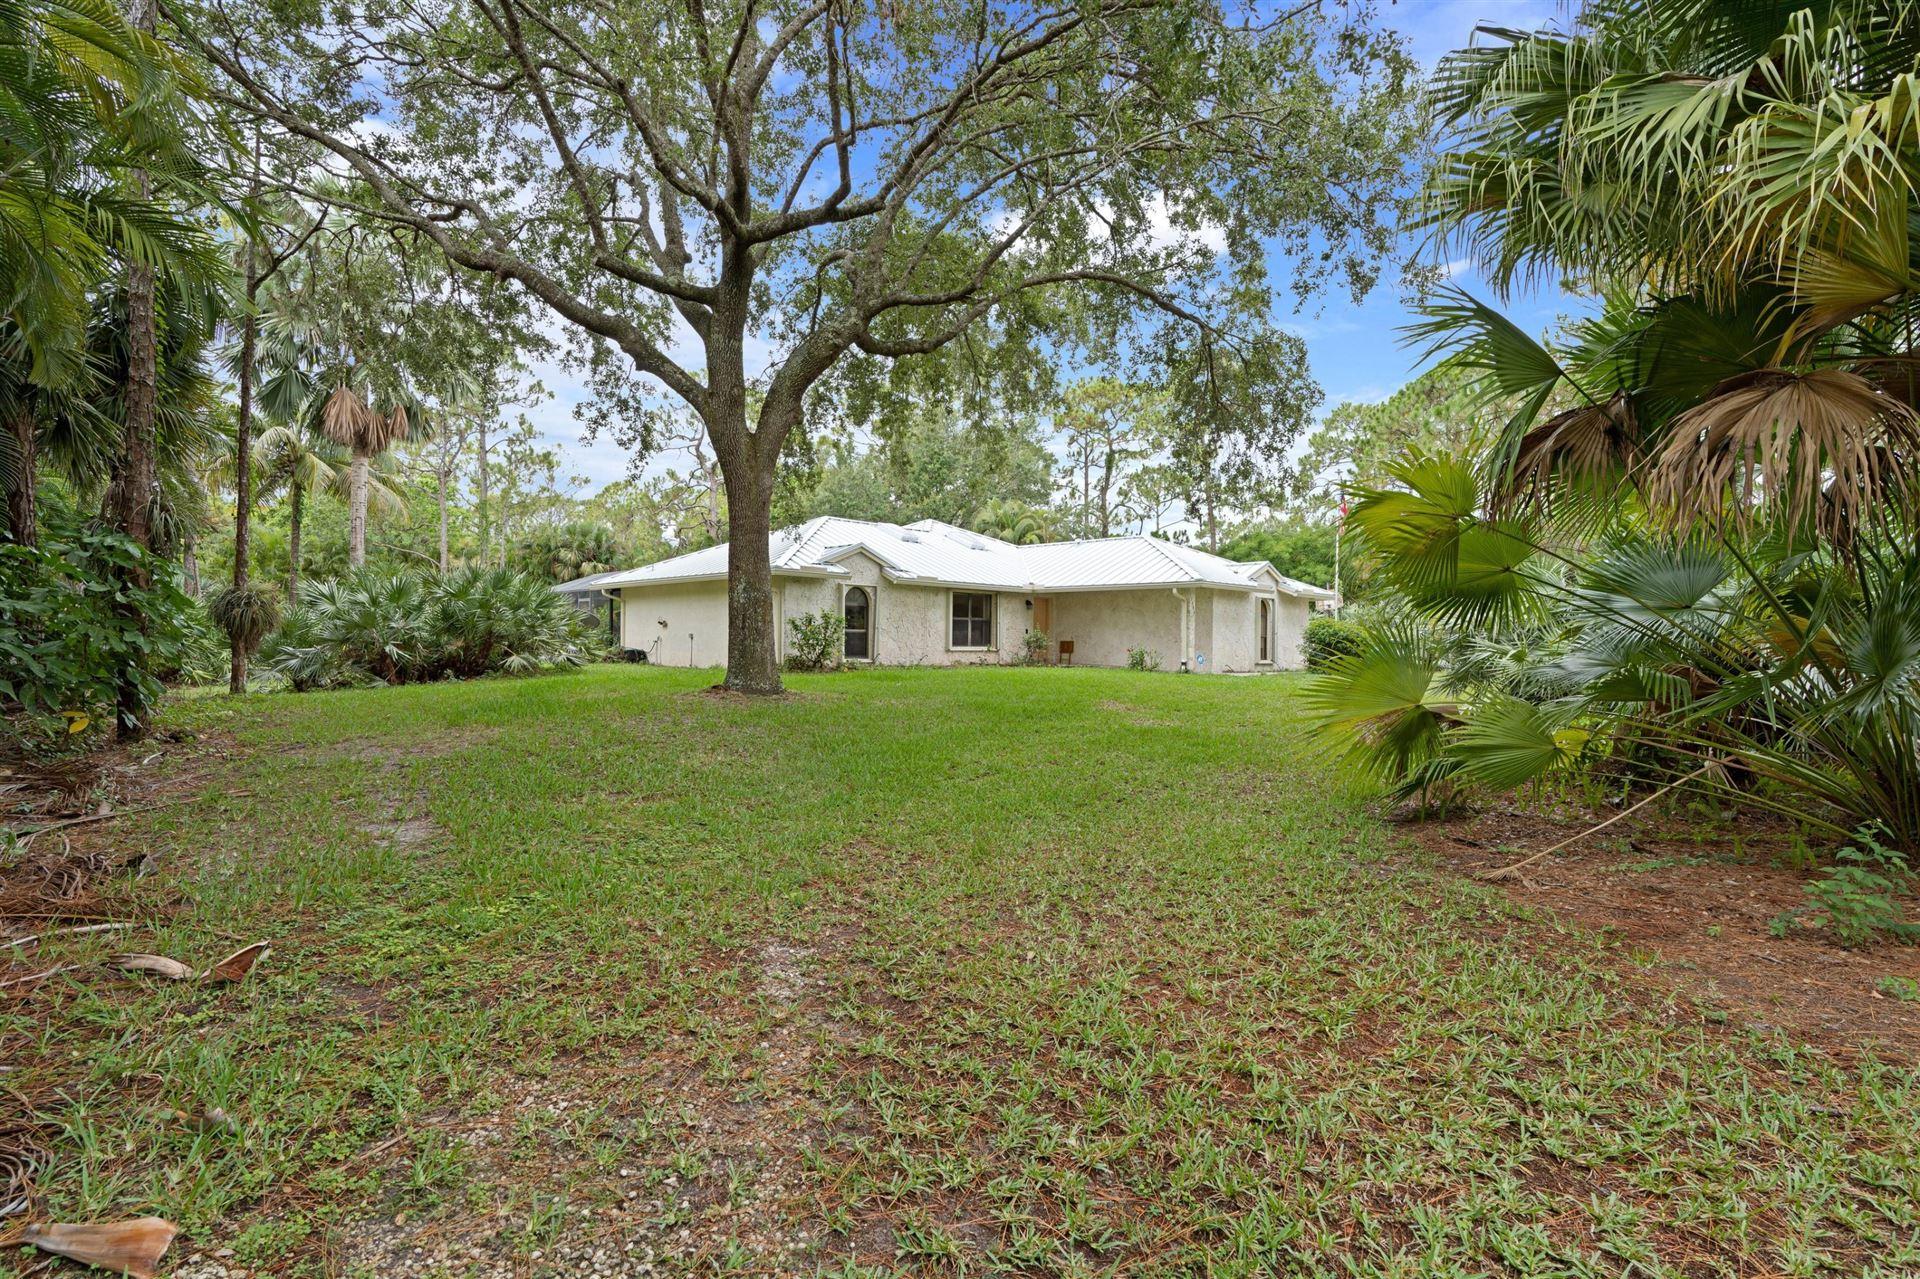 13086 52nd Court N, West Palm Beach, FL 33411 - #: RX-10725209